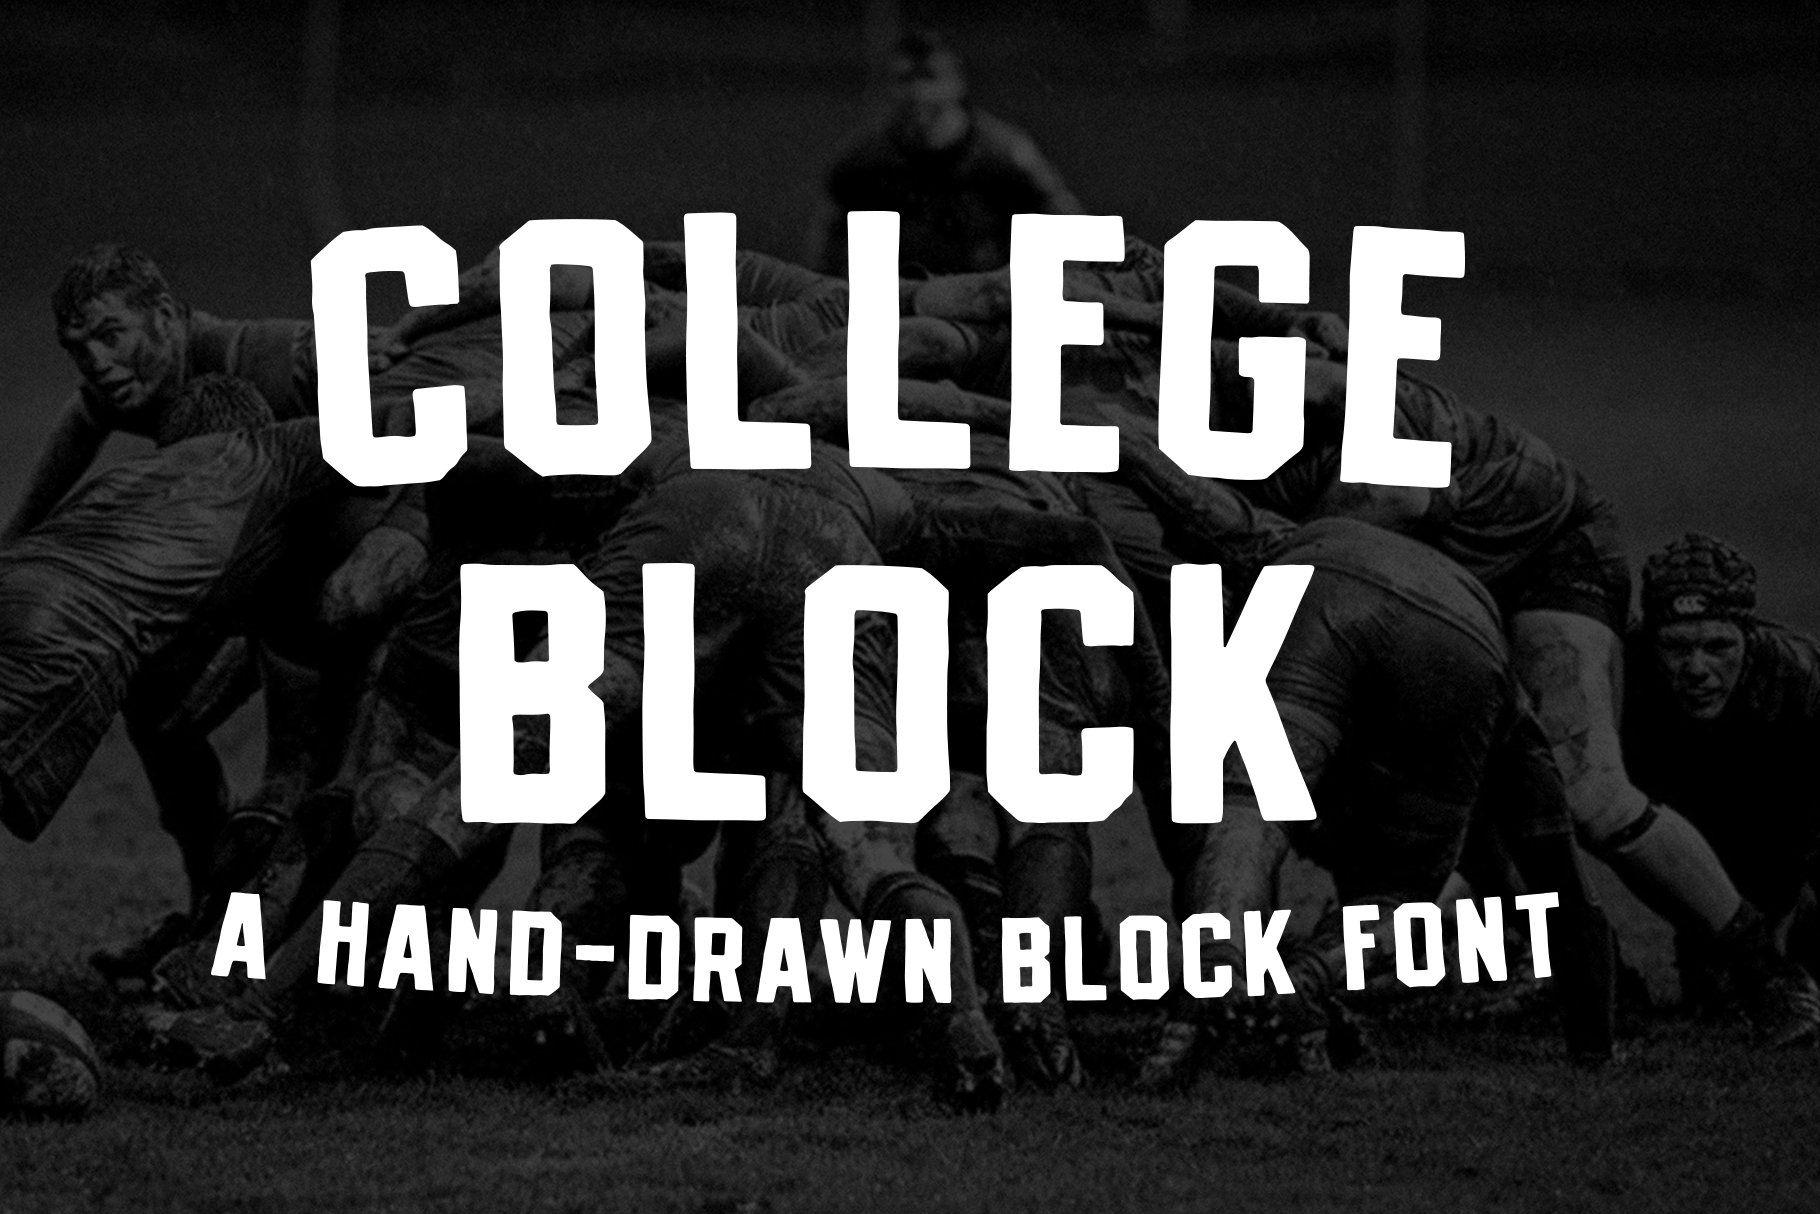 College Block A Vintage Block Font In 2020 Block Fonts Types Of Lettering Soft Blocks